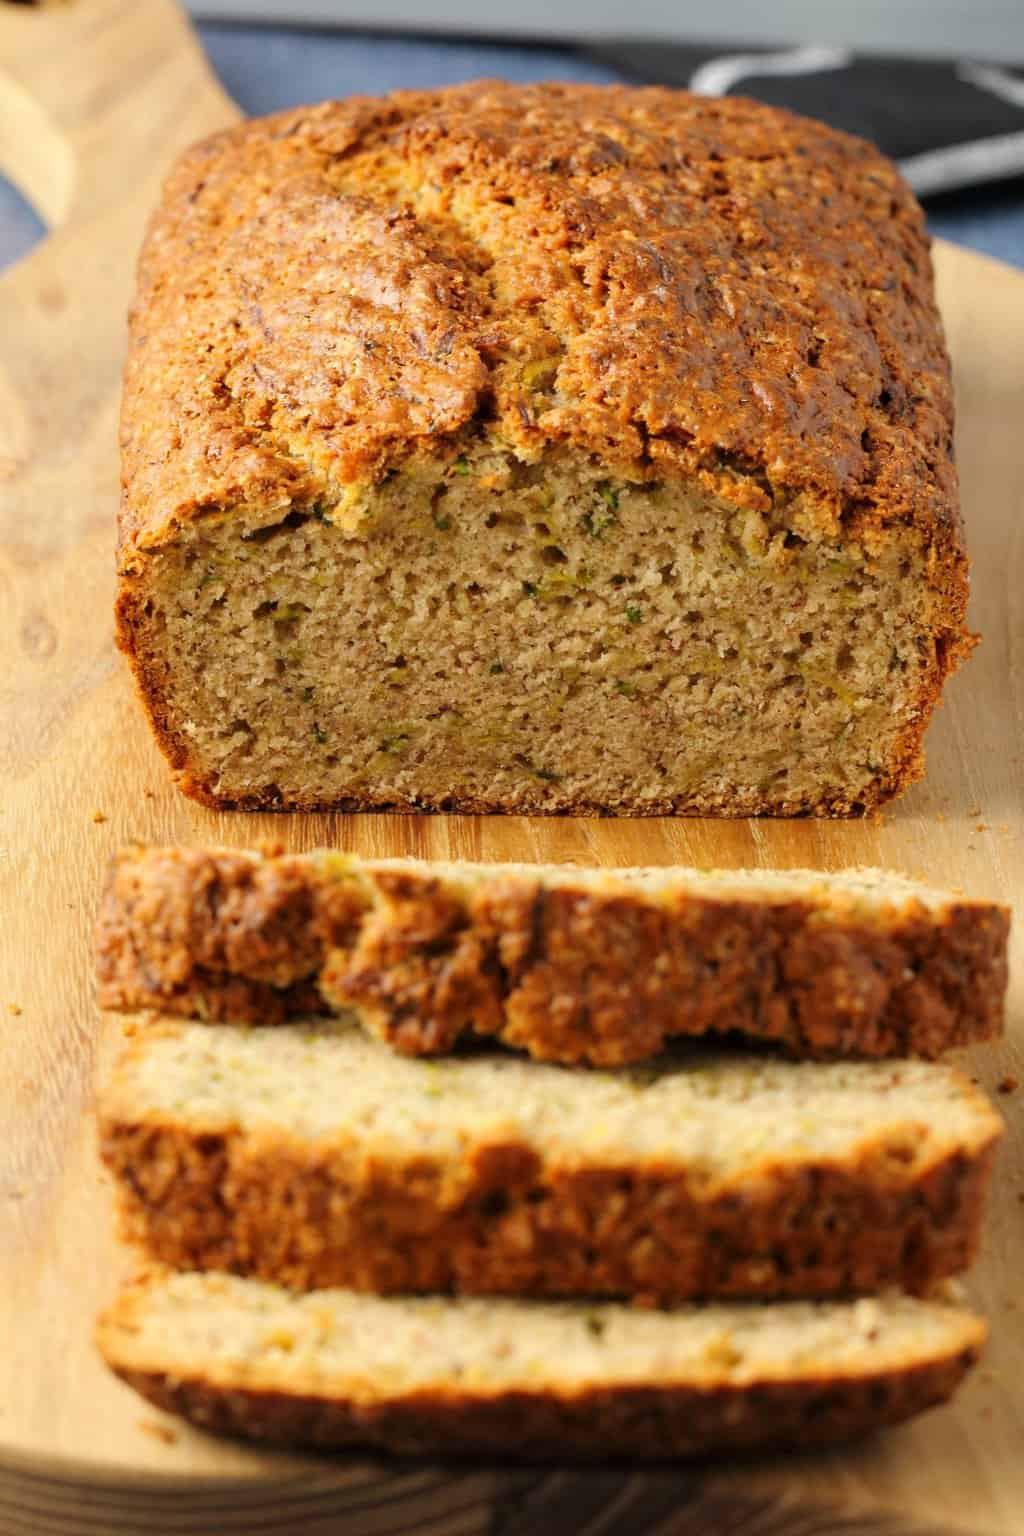 Zucchini Bread Vegan  Vegan Zucchini Bread Fluffy and Perfectly Moist Loving